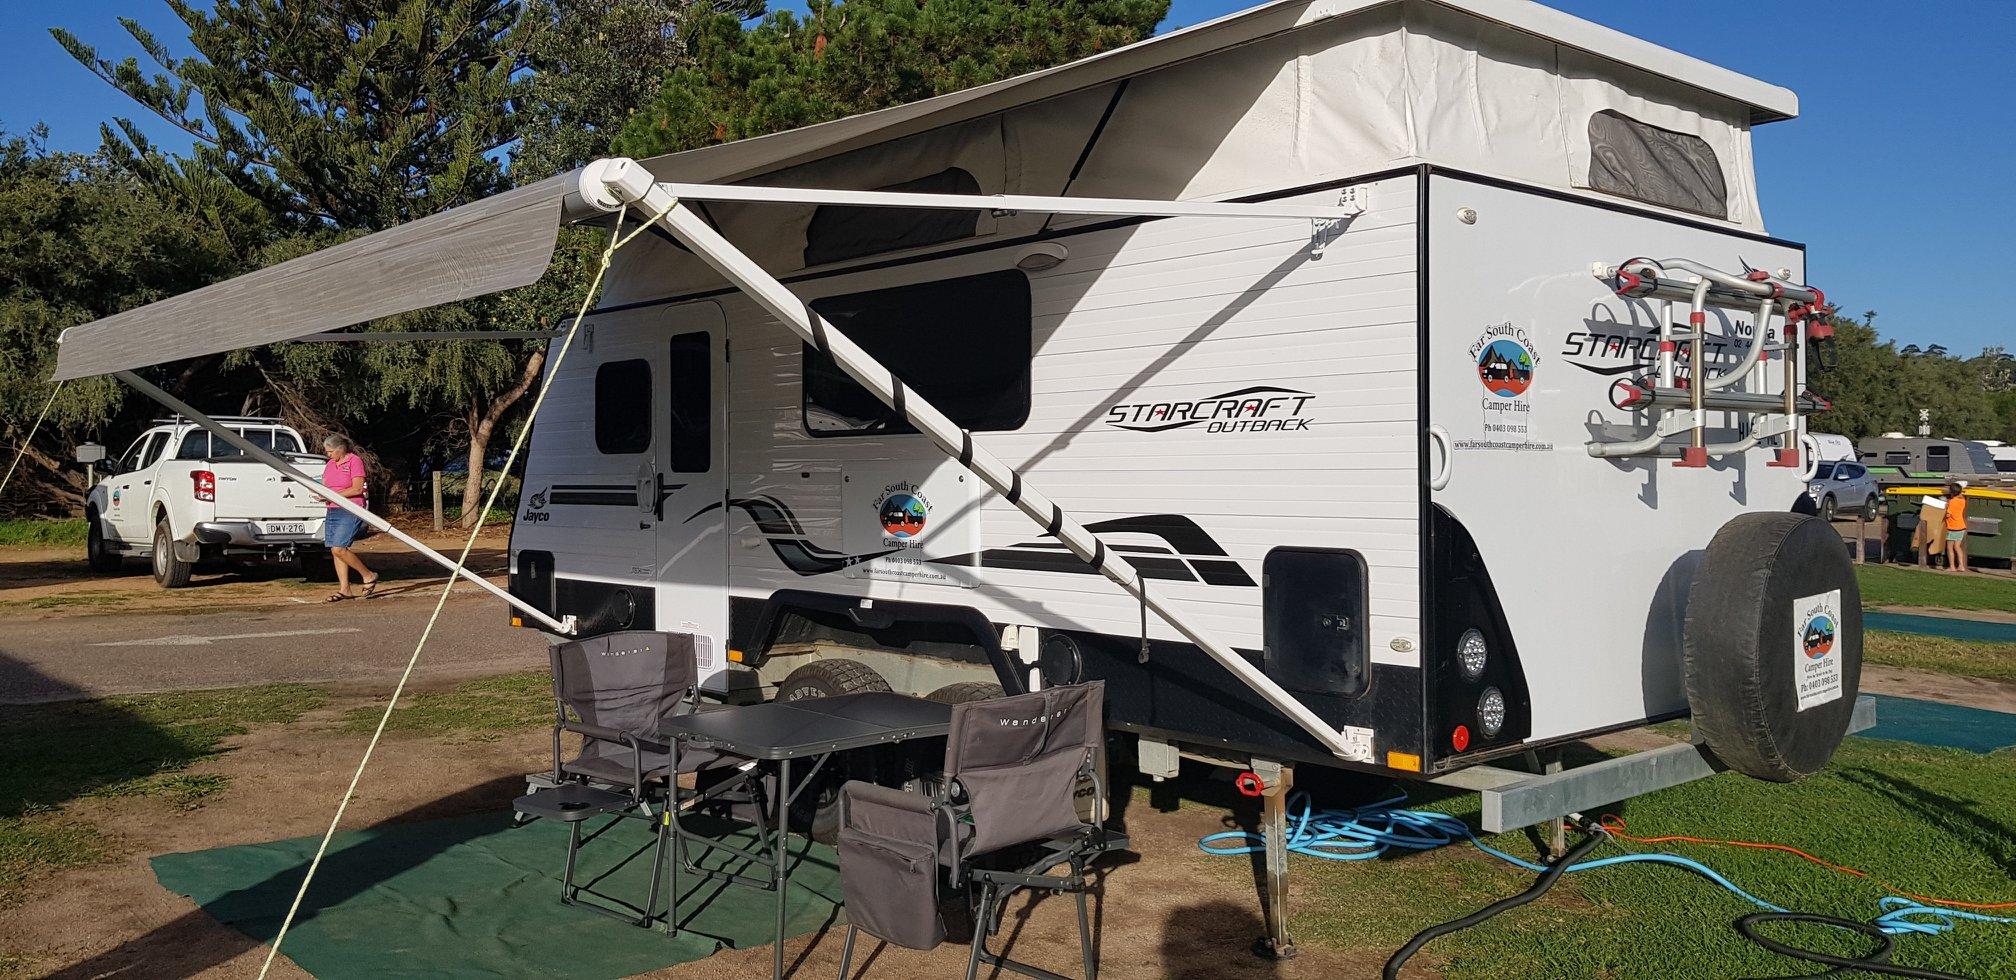 PTS Far South Coast Camper Hire.jpg